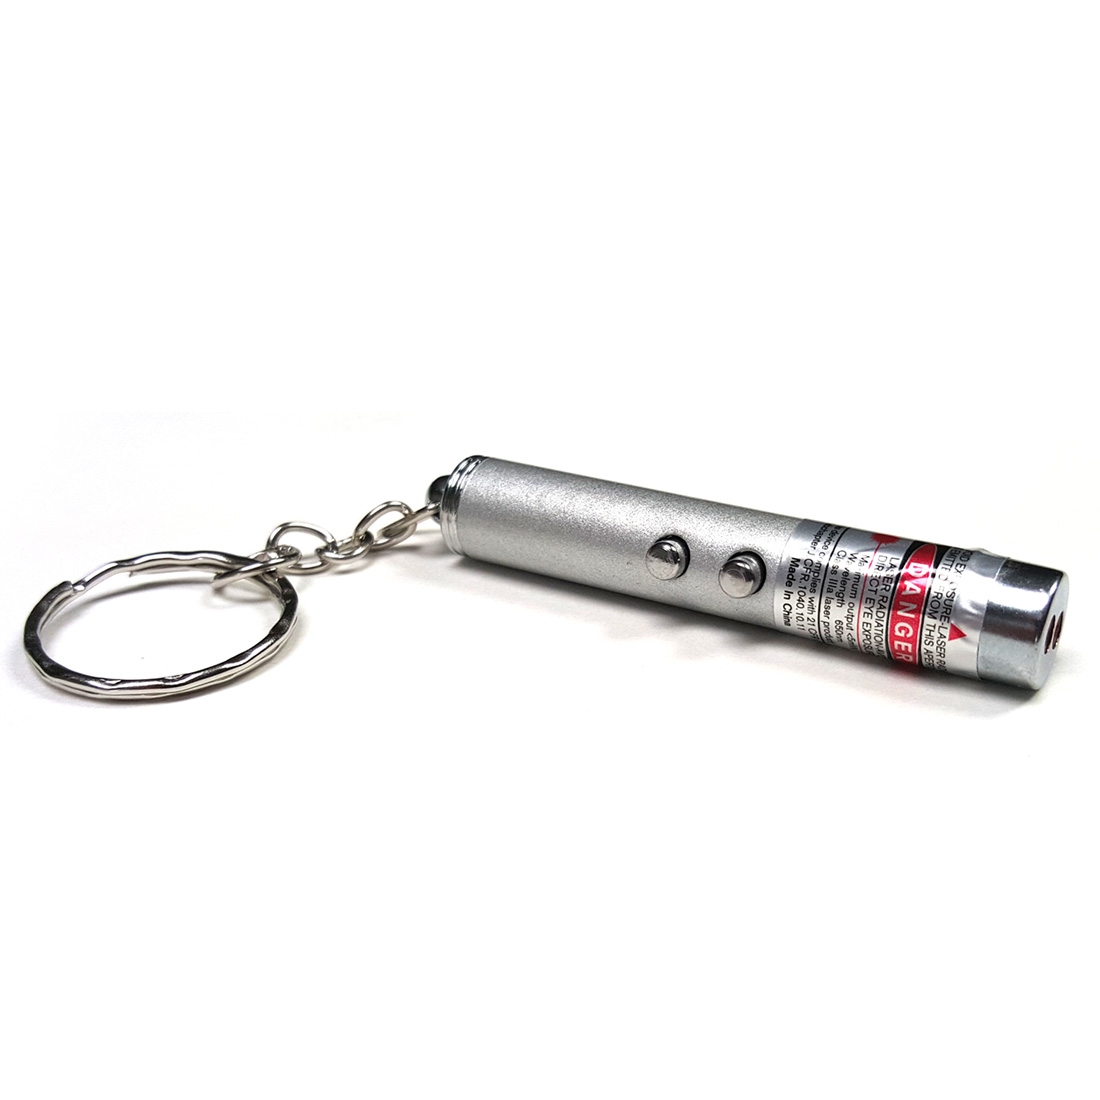 2 In 1 Micro Laser Keychain Flashlight